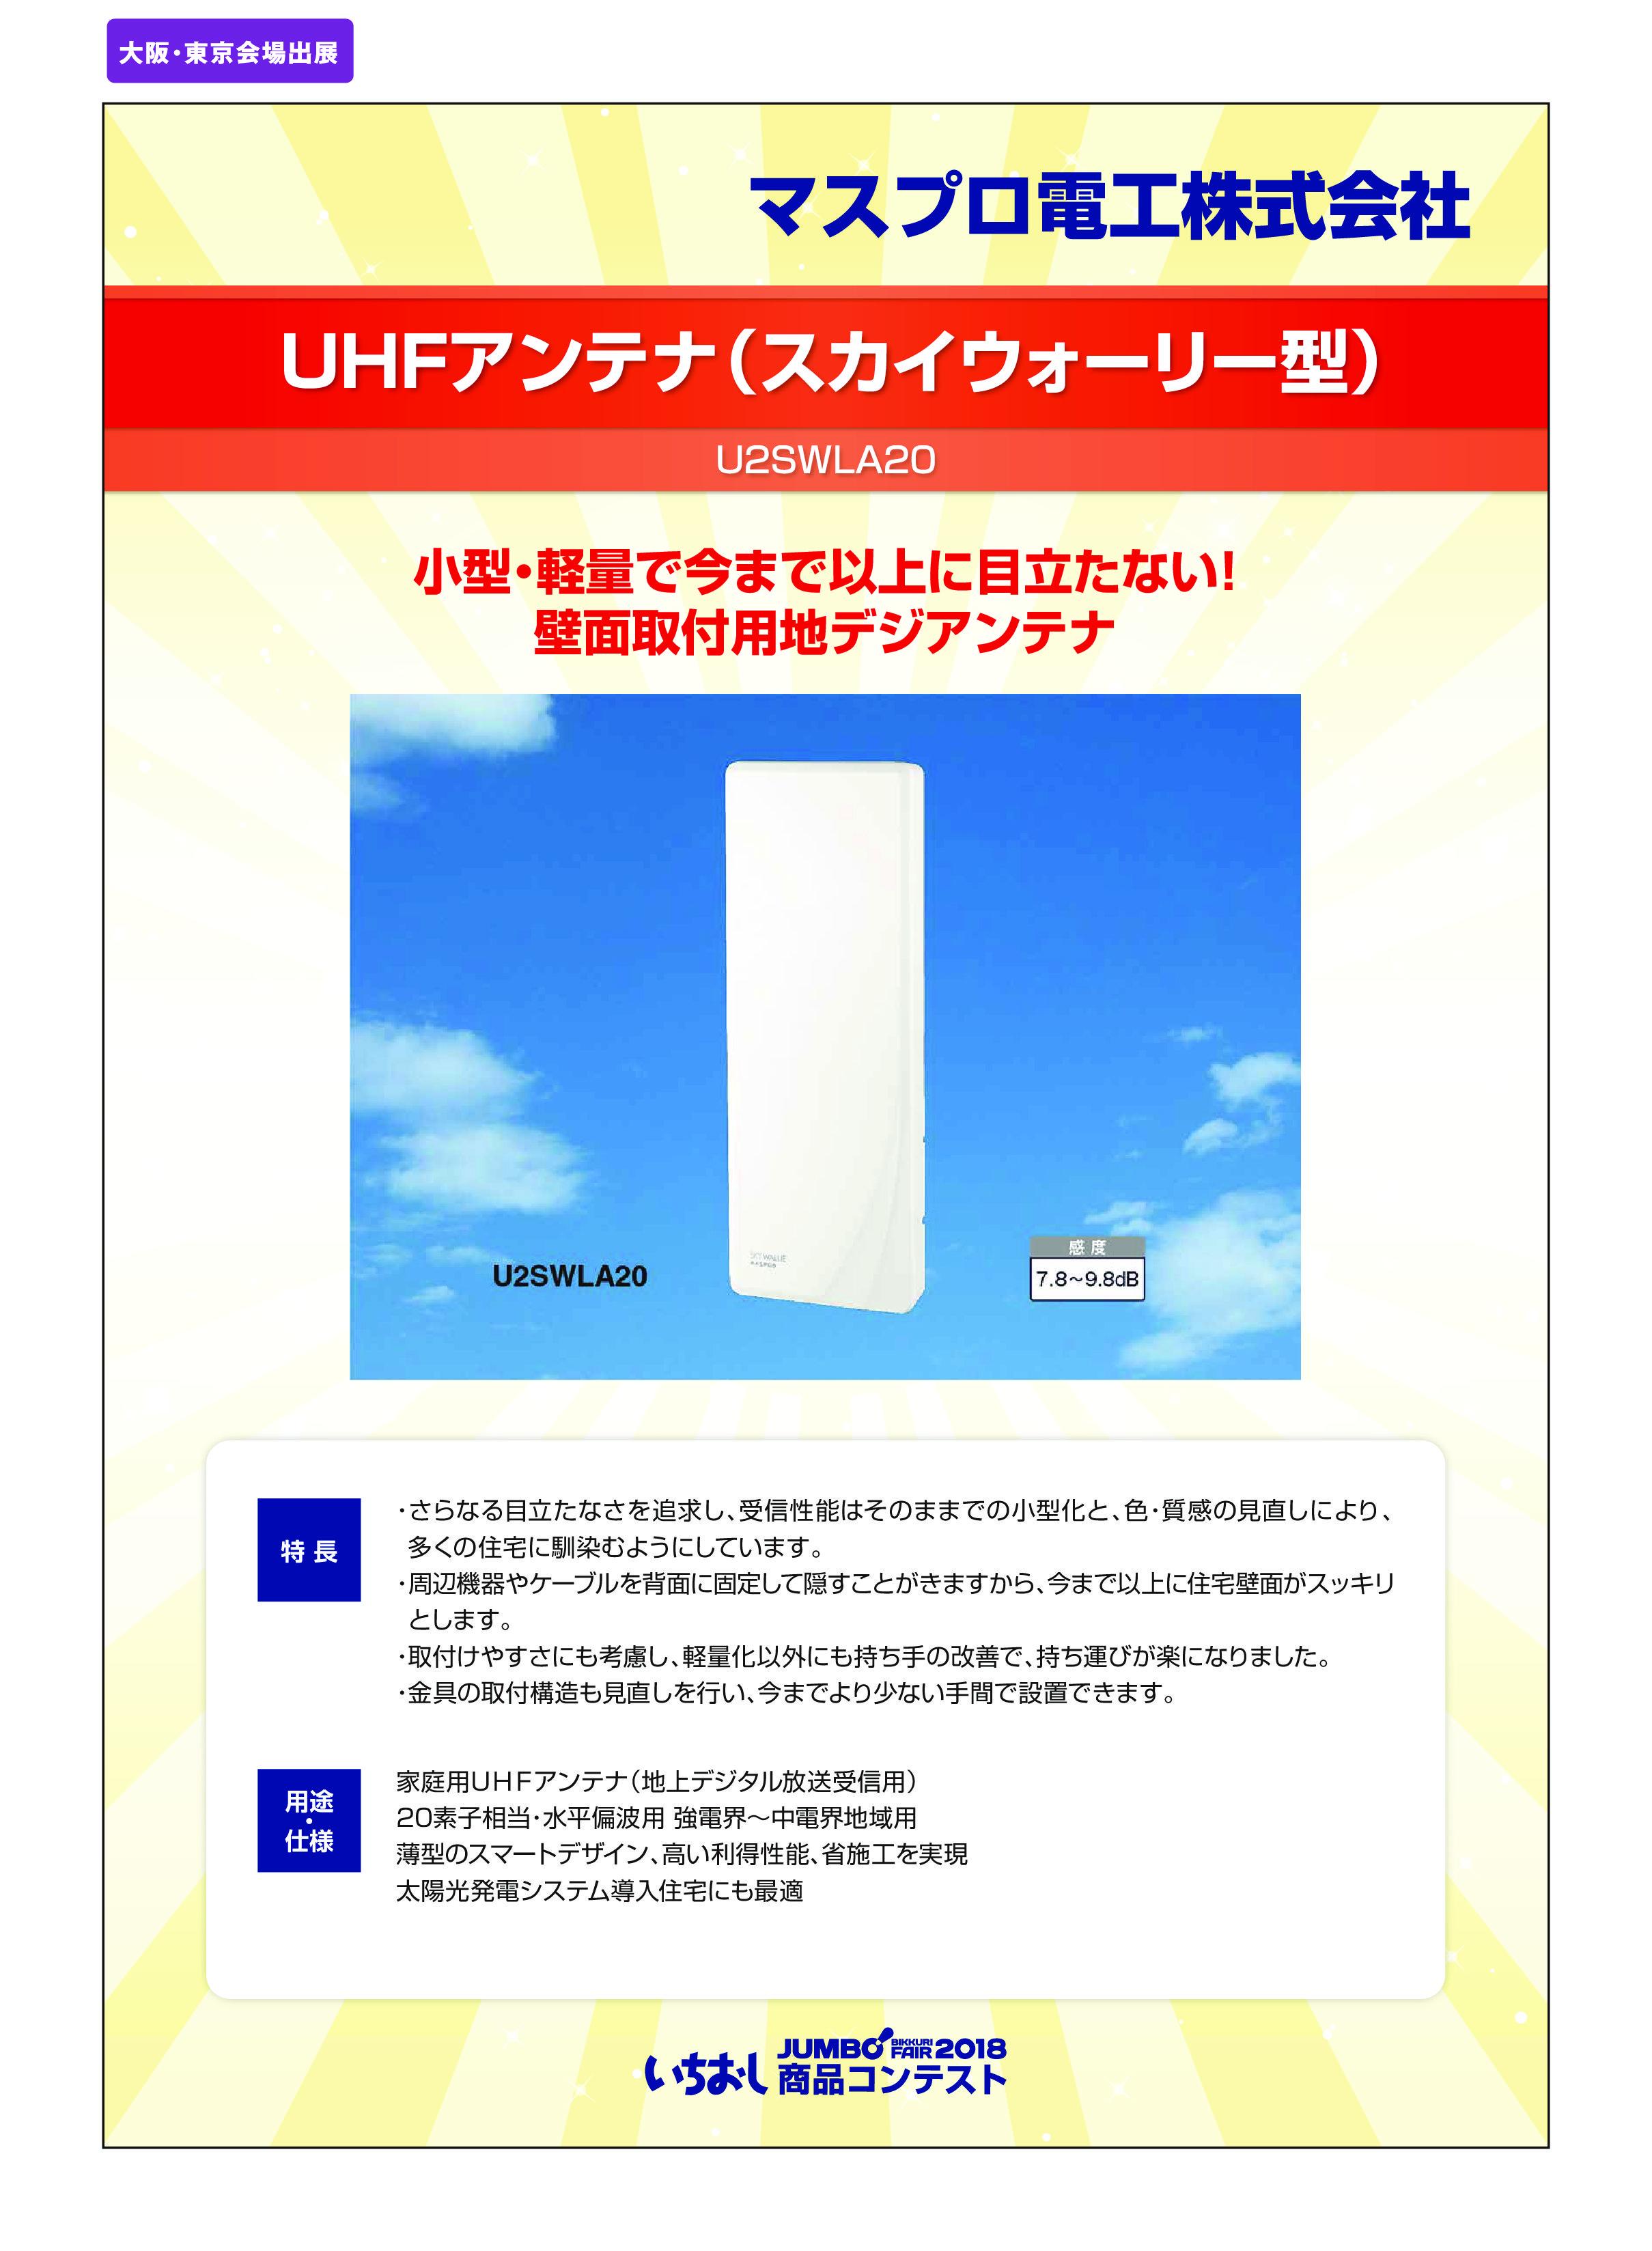 「UHFアンテナ(スカイウォーリー型)」マスプロ電工株式会社の画像